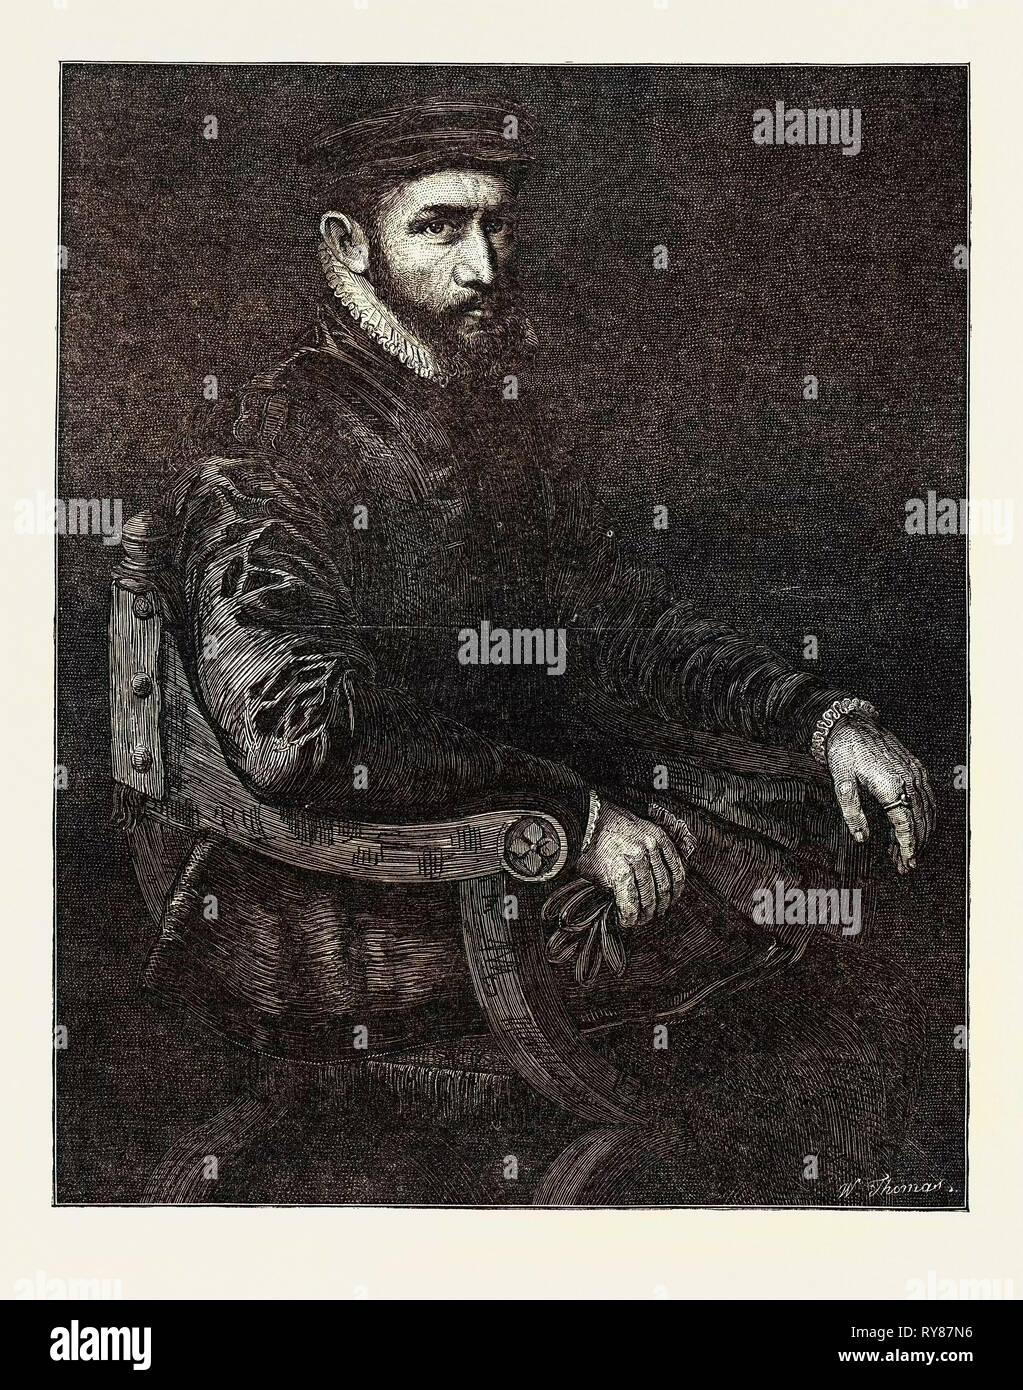 Sir Thomas Gresham, in the National Portrait Exhibition South Kensington London UK - Stock Image